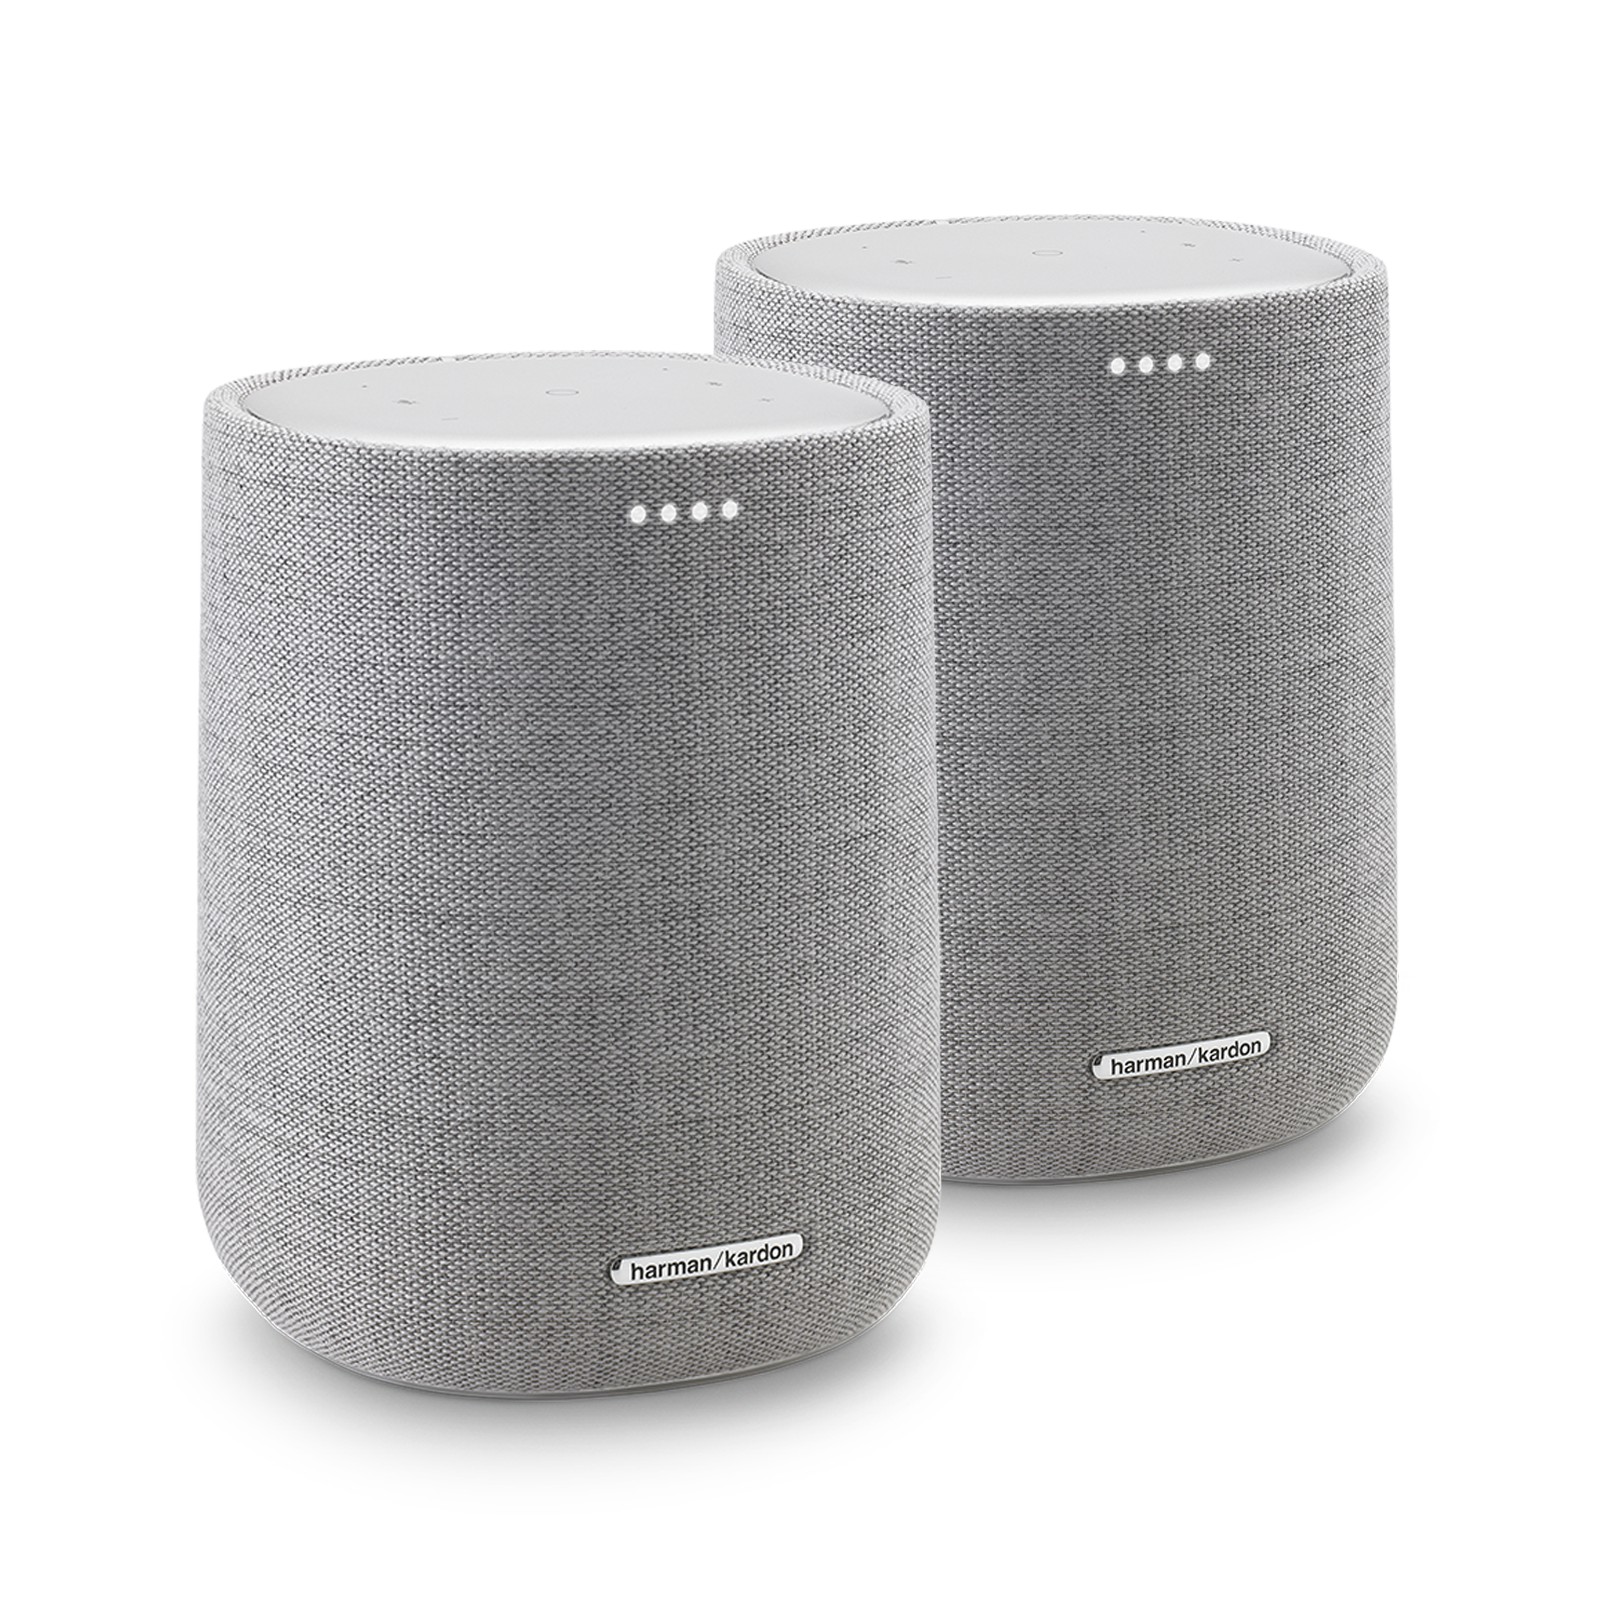 Harman Kardon Citation ONE DUO - Grey - Compact, smart and amazing sound - Hero